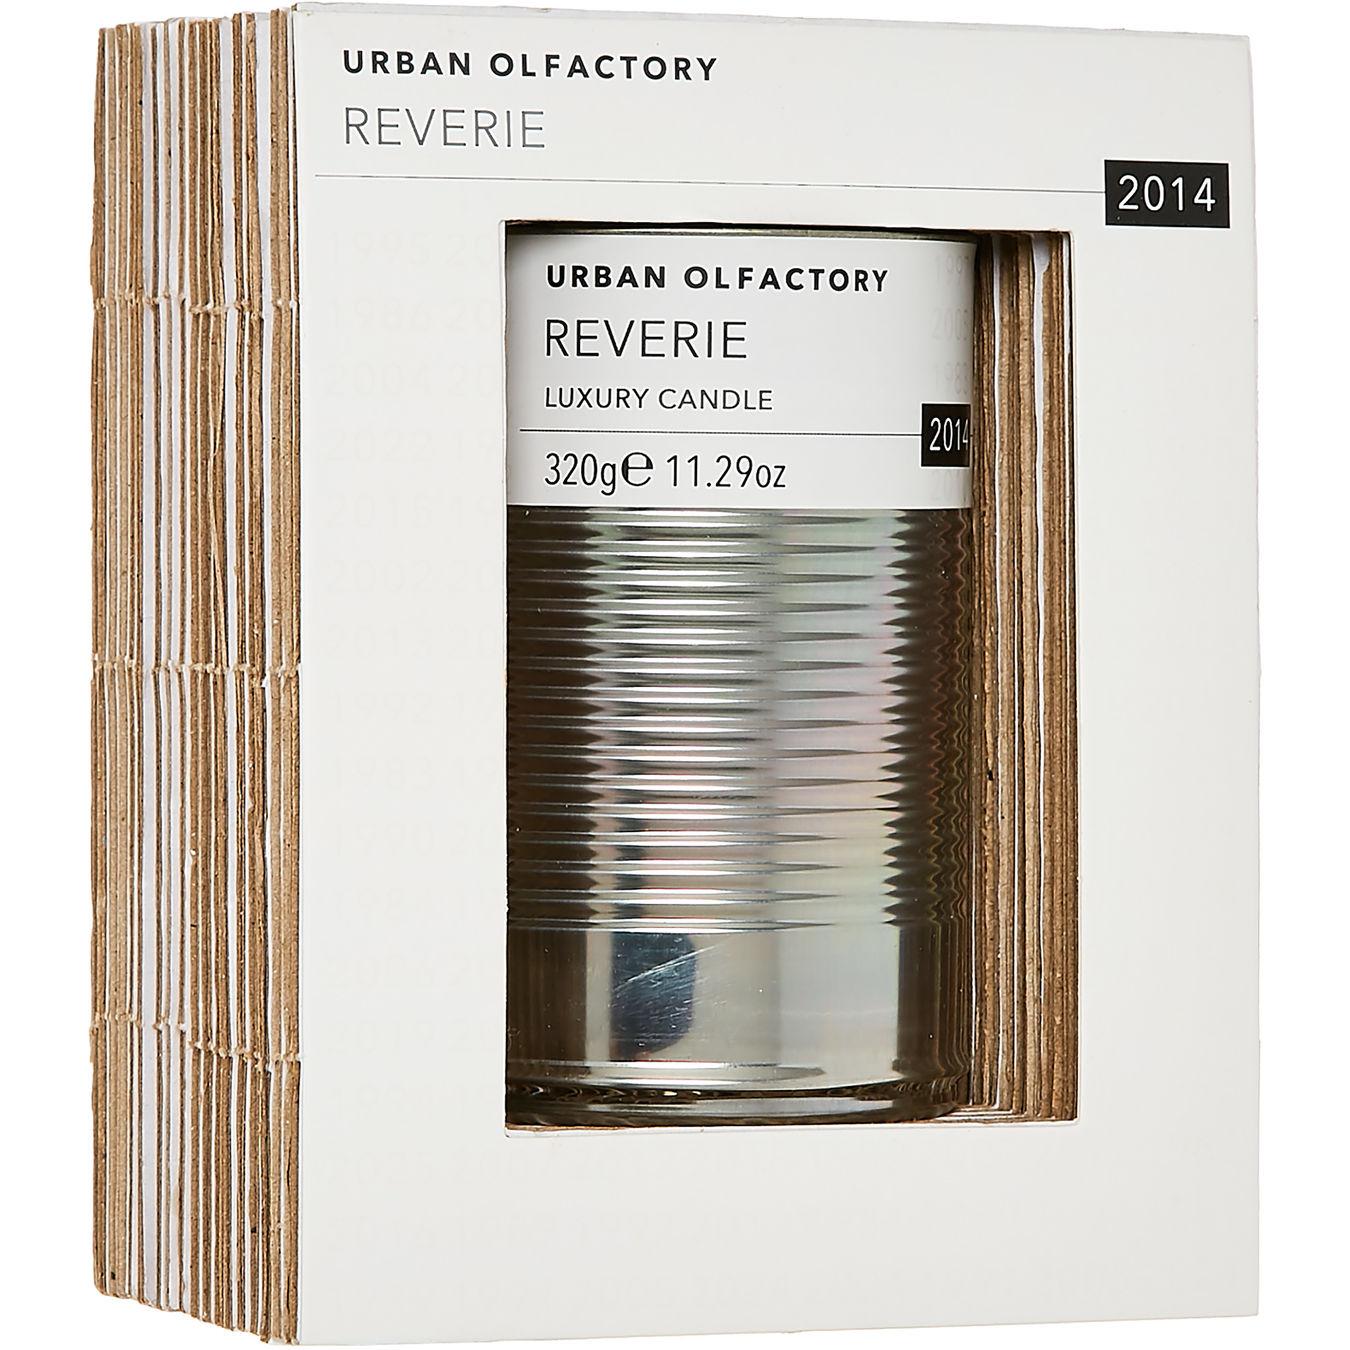 Urban Olfactory - £12.99 @ TK Maxx